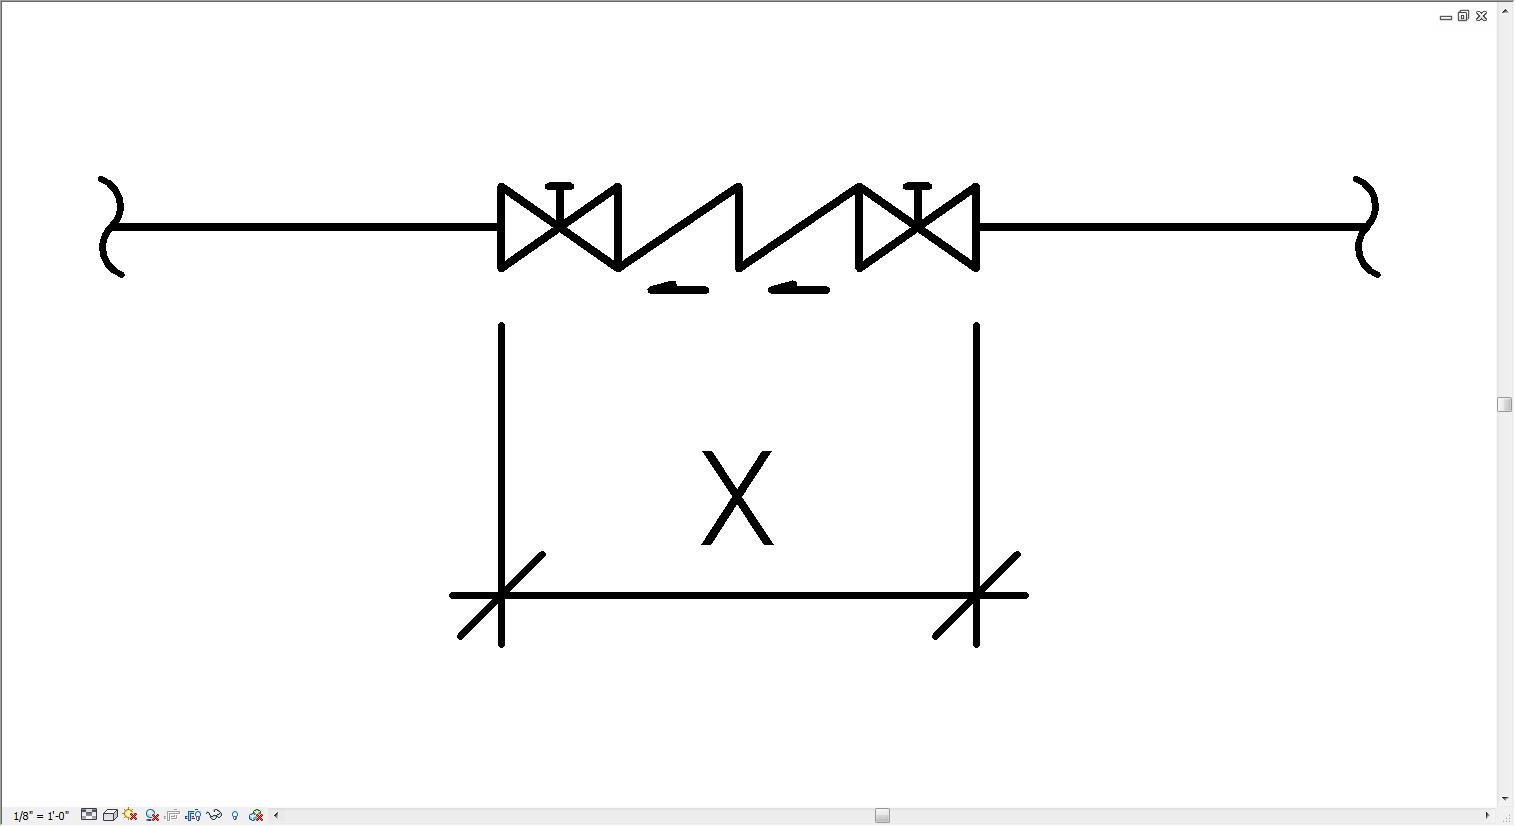 Hydraulic Valve Schematic Symbol